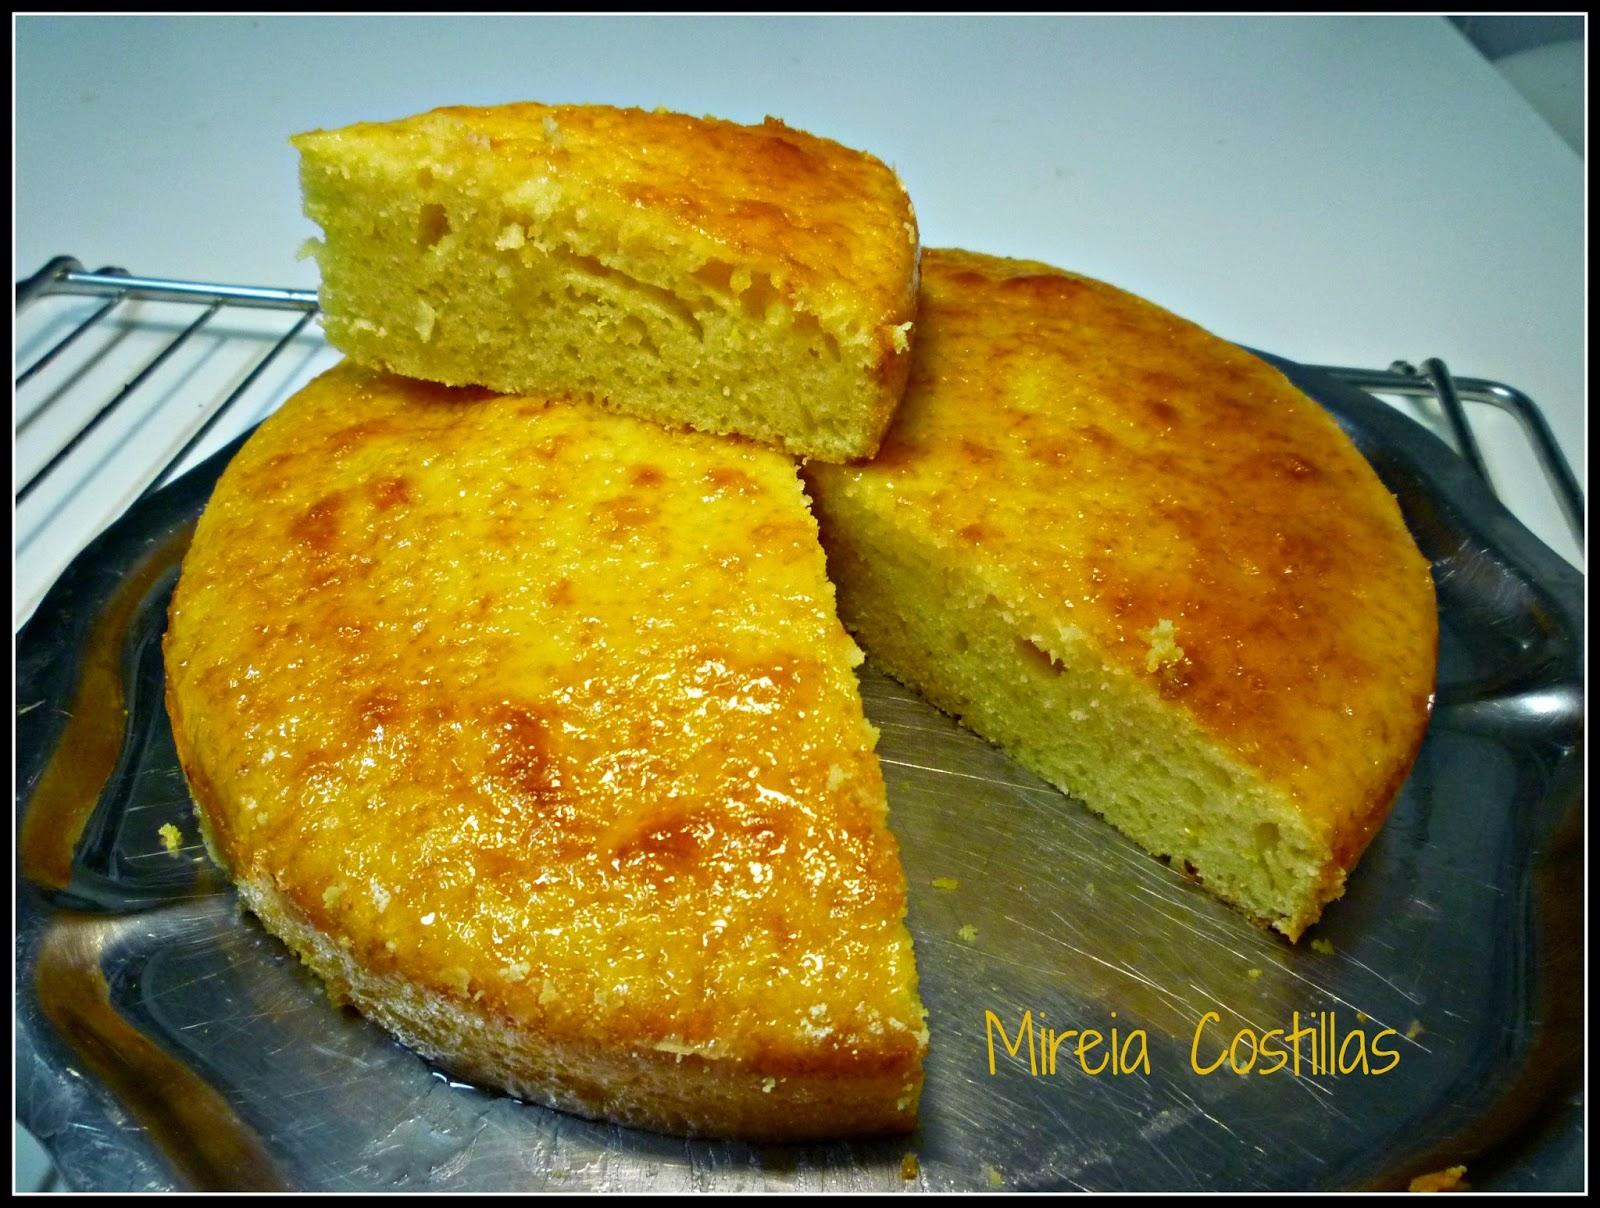 Pasi n y tentaci n lemon drizzle cake o bizcocho h medo - Bizcocho de limon esponjoso ...